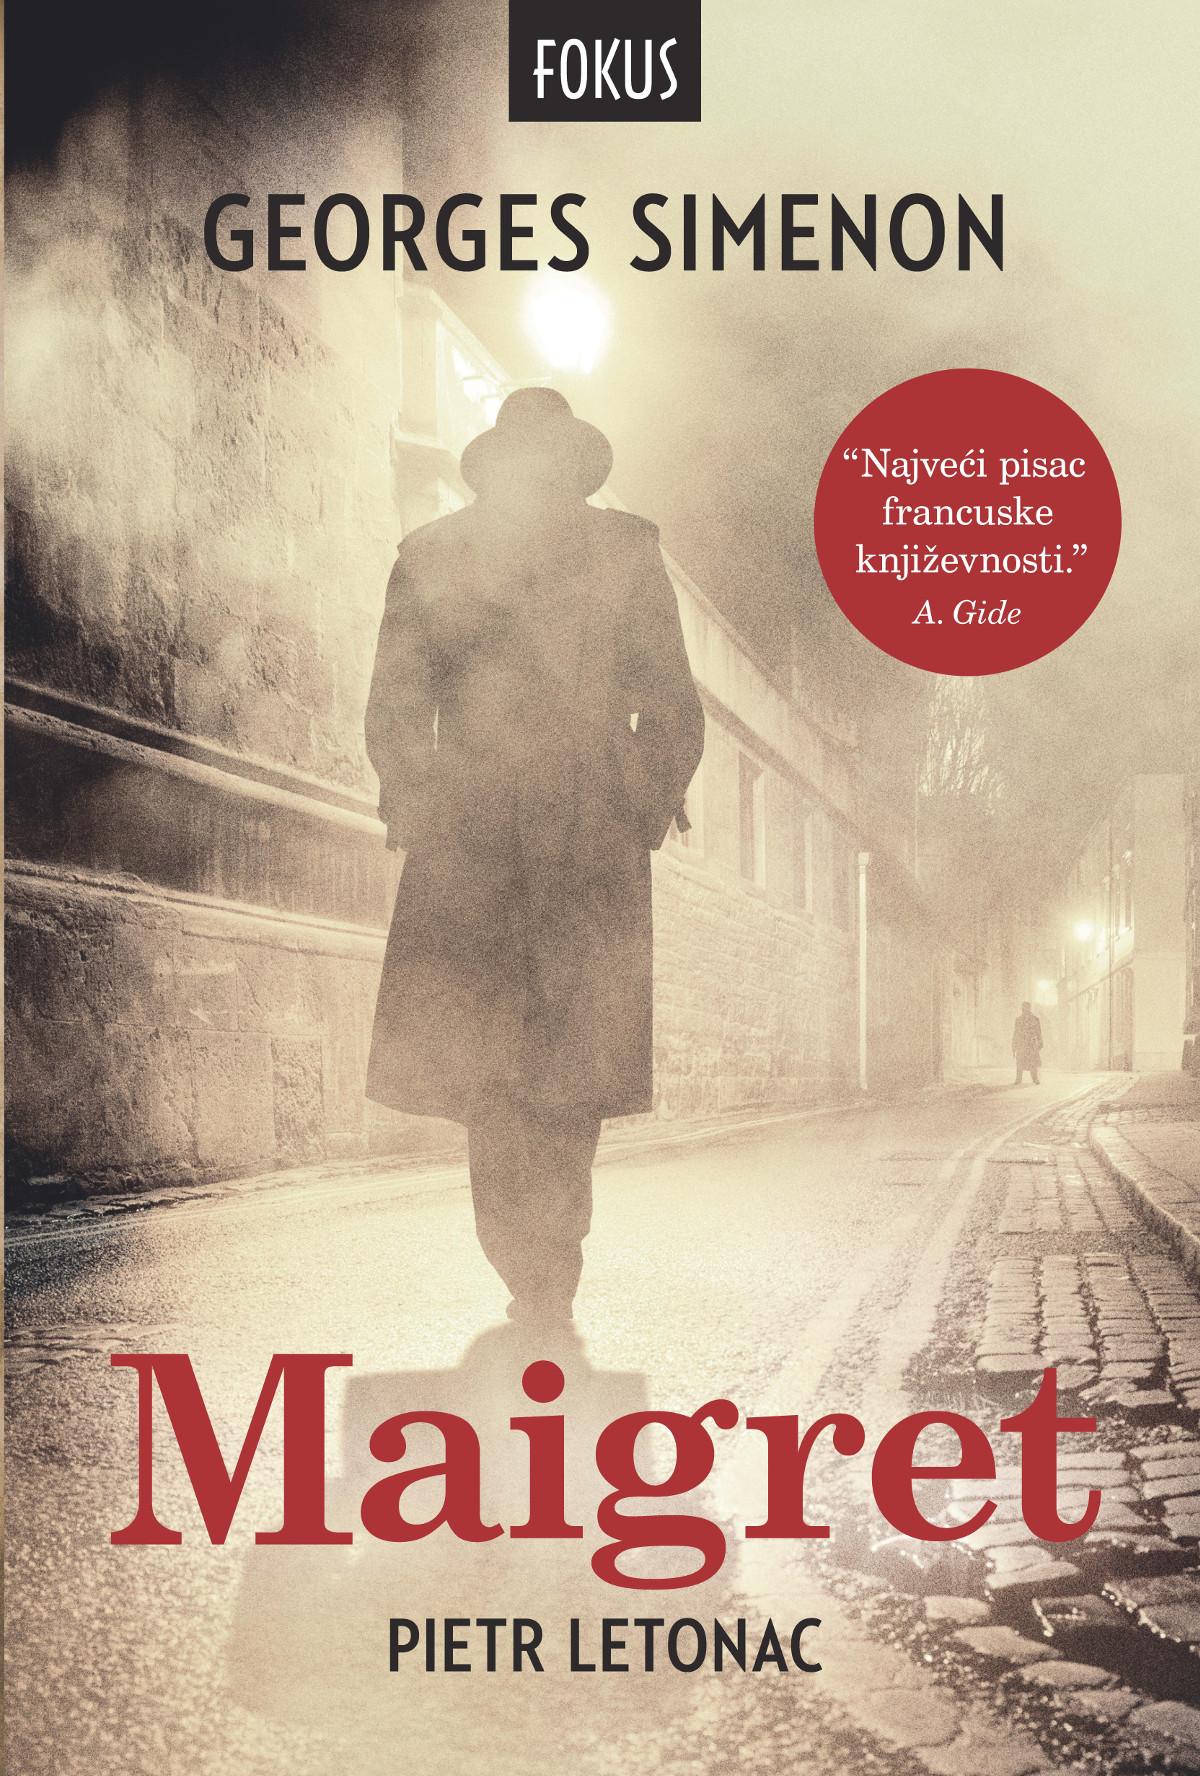 Pietr Letonac (Maigret #1) Georges Simenon